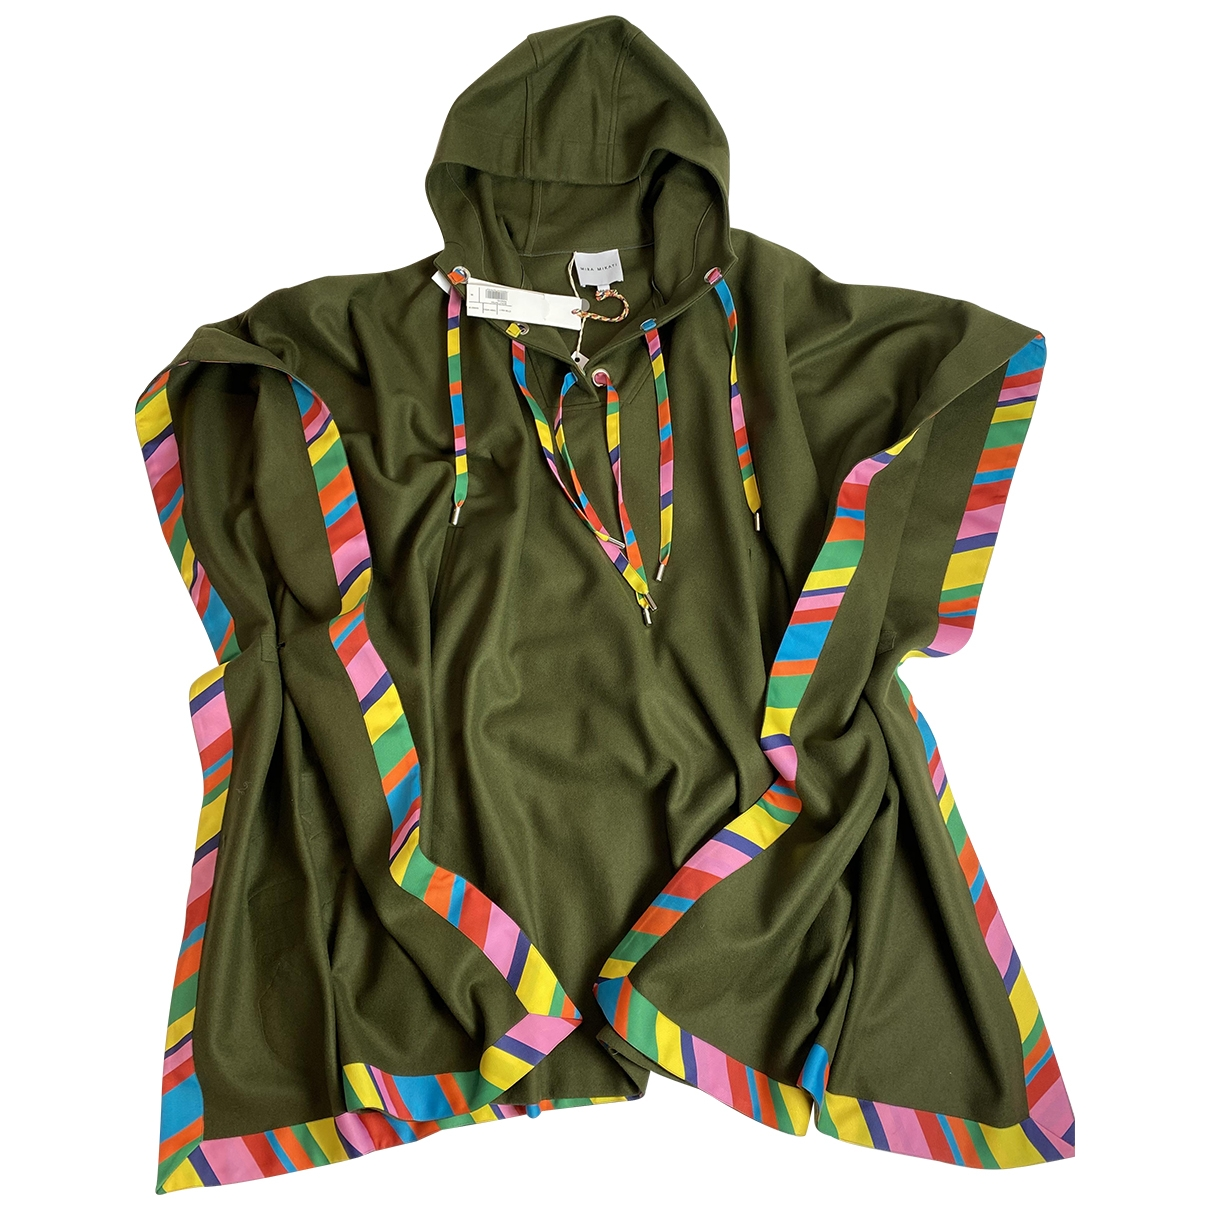 Mira Mikati - Manteau   pour femme en laine - kaki